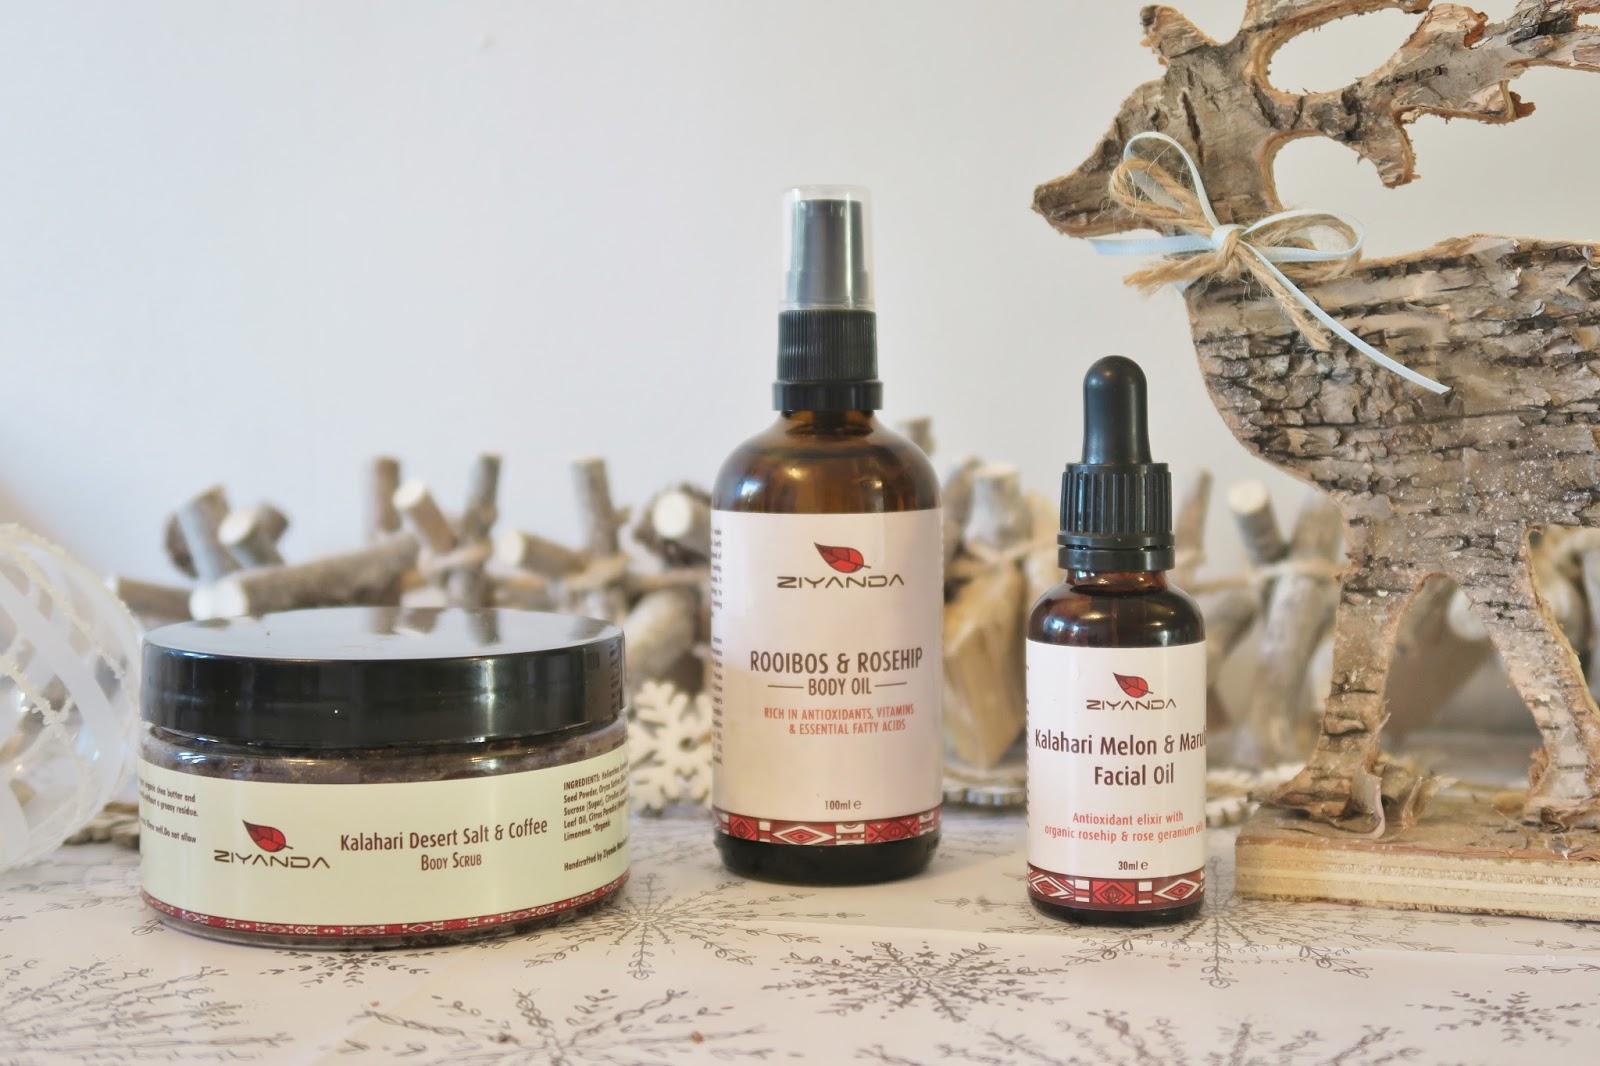 Christmas Gift Guide Amber's Beauty Talk | Ziyanda Skincare